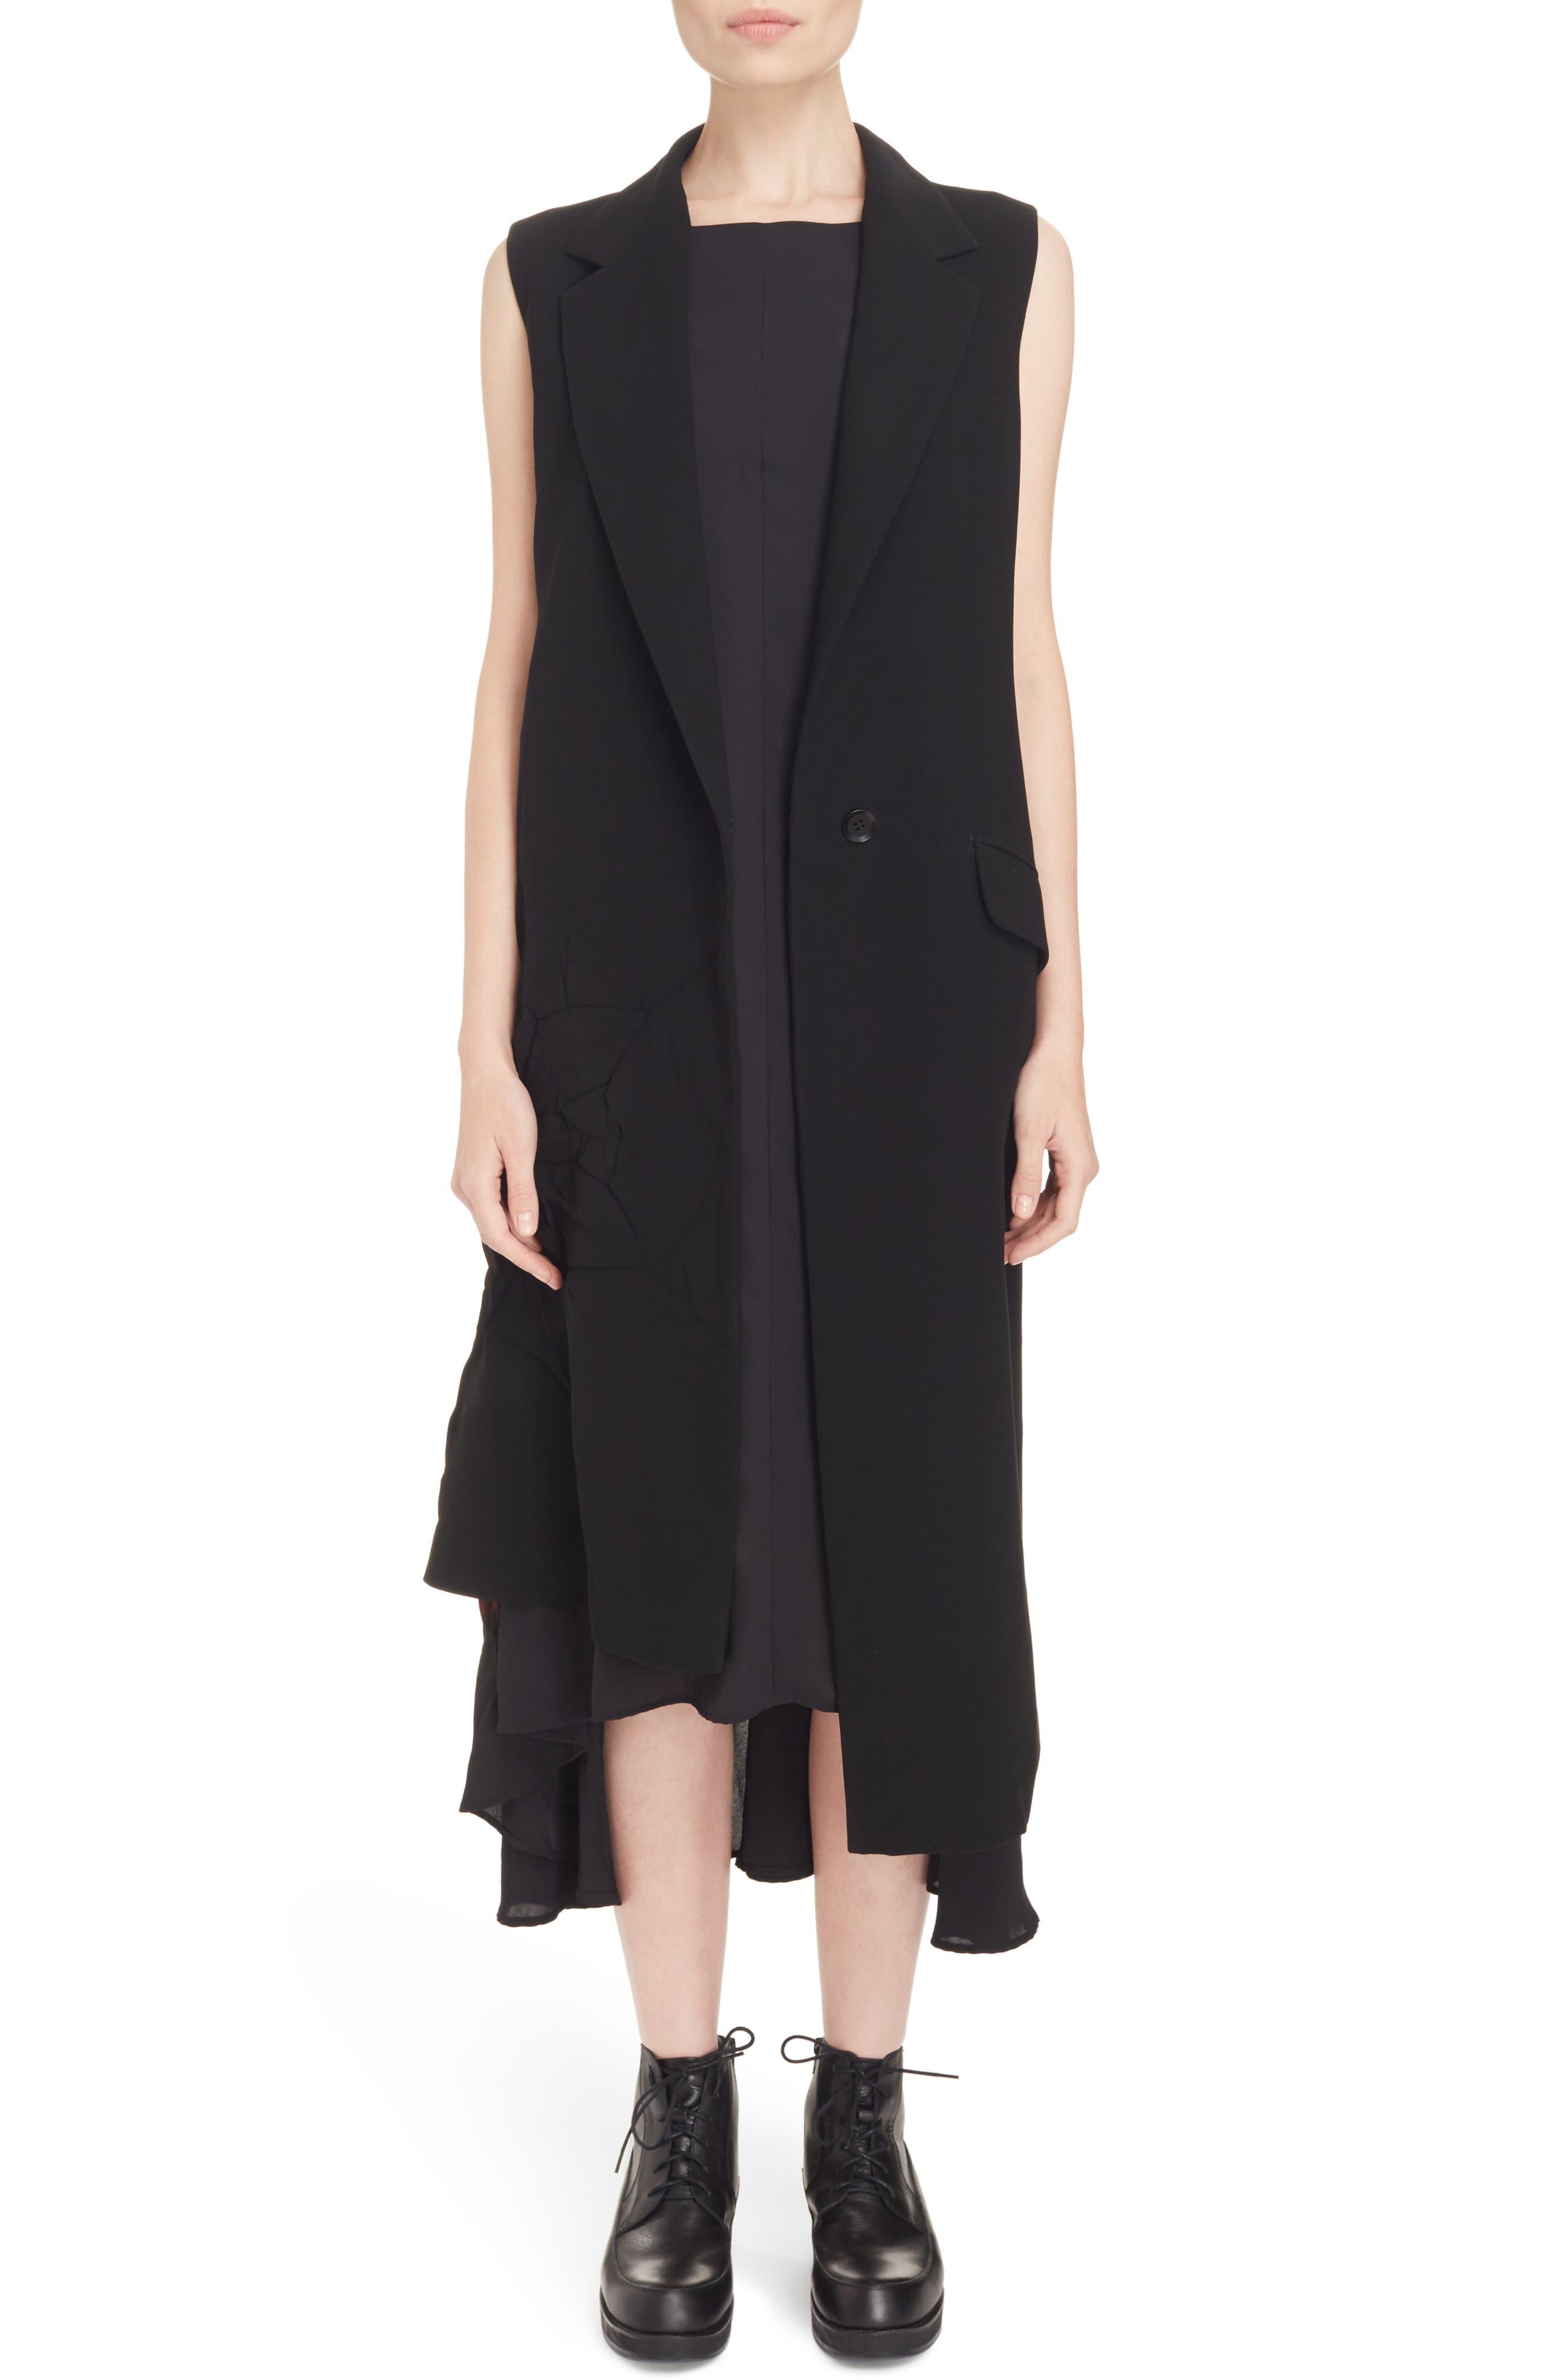 Alternate Image 1 Selected - Y's by Yohji Yamamoto Asymmetrical Vest